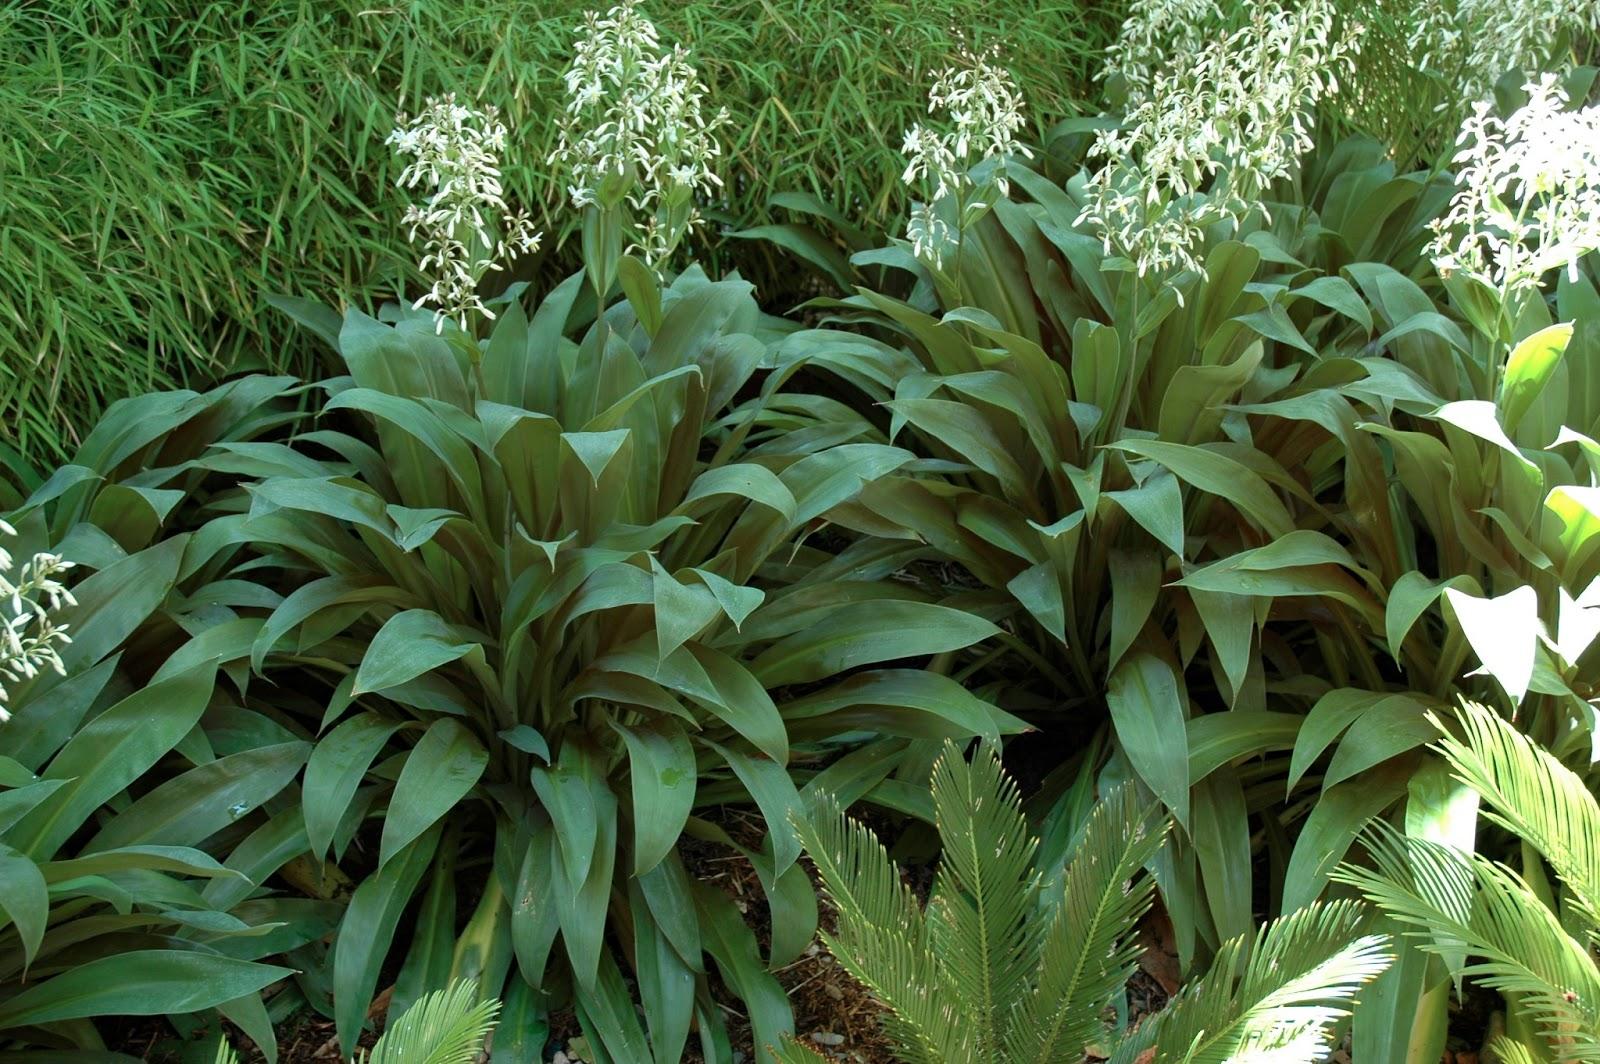 PLANT OF THE MONTH - ARTHROPODIUM CIRRATUM | JENNY SMITH GARDENS